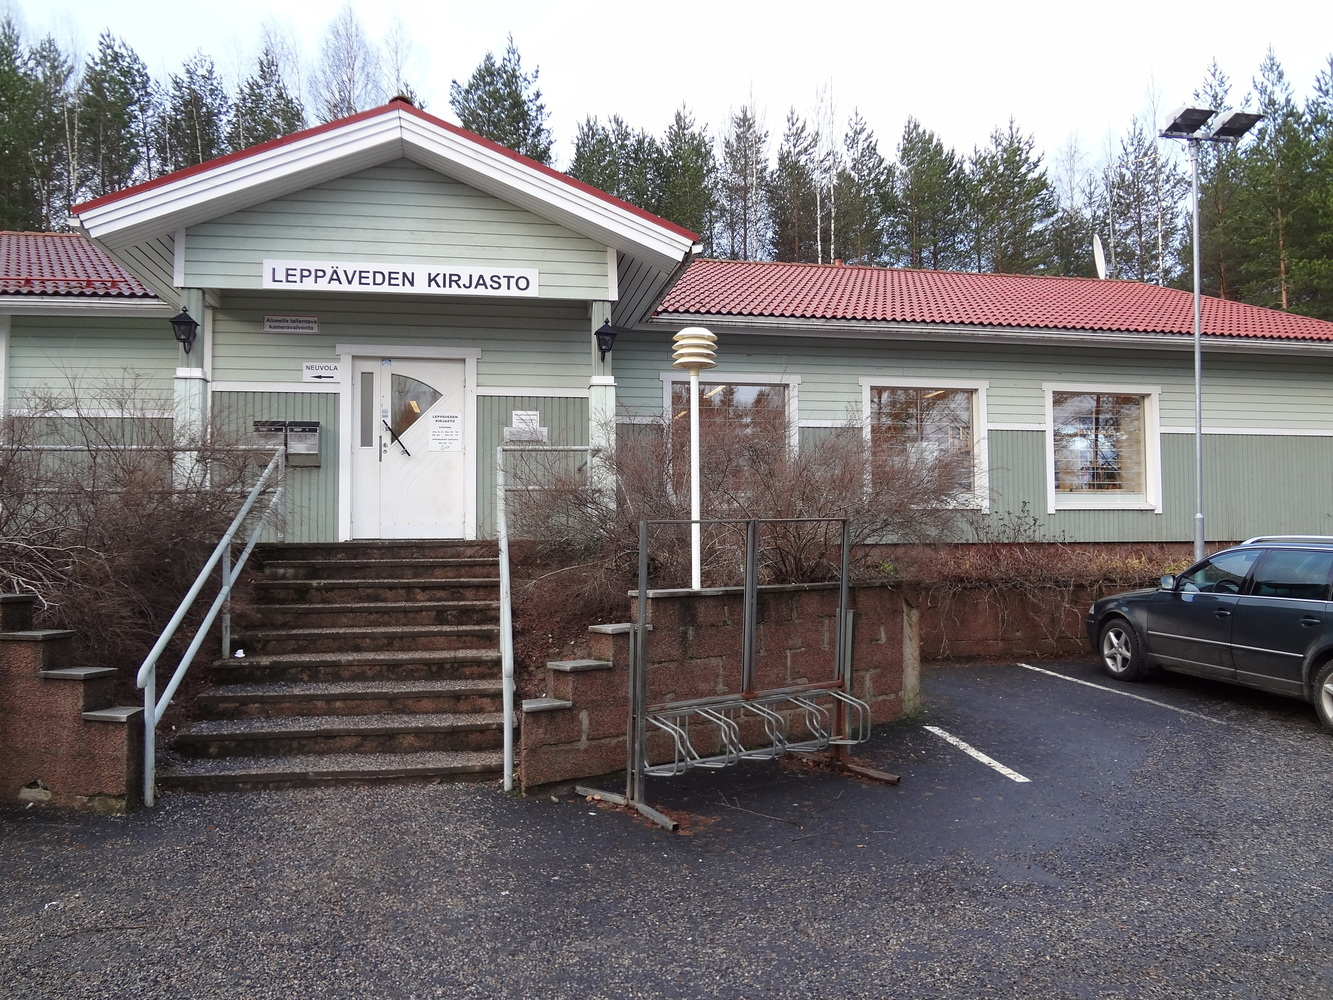 Leppäveden kirjasto